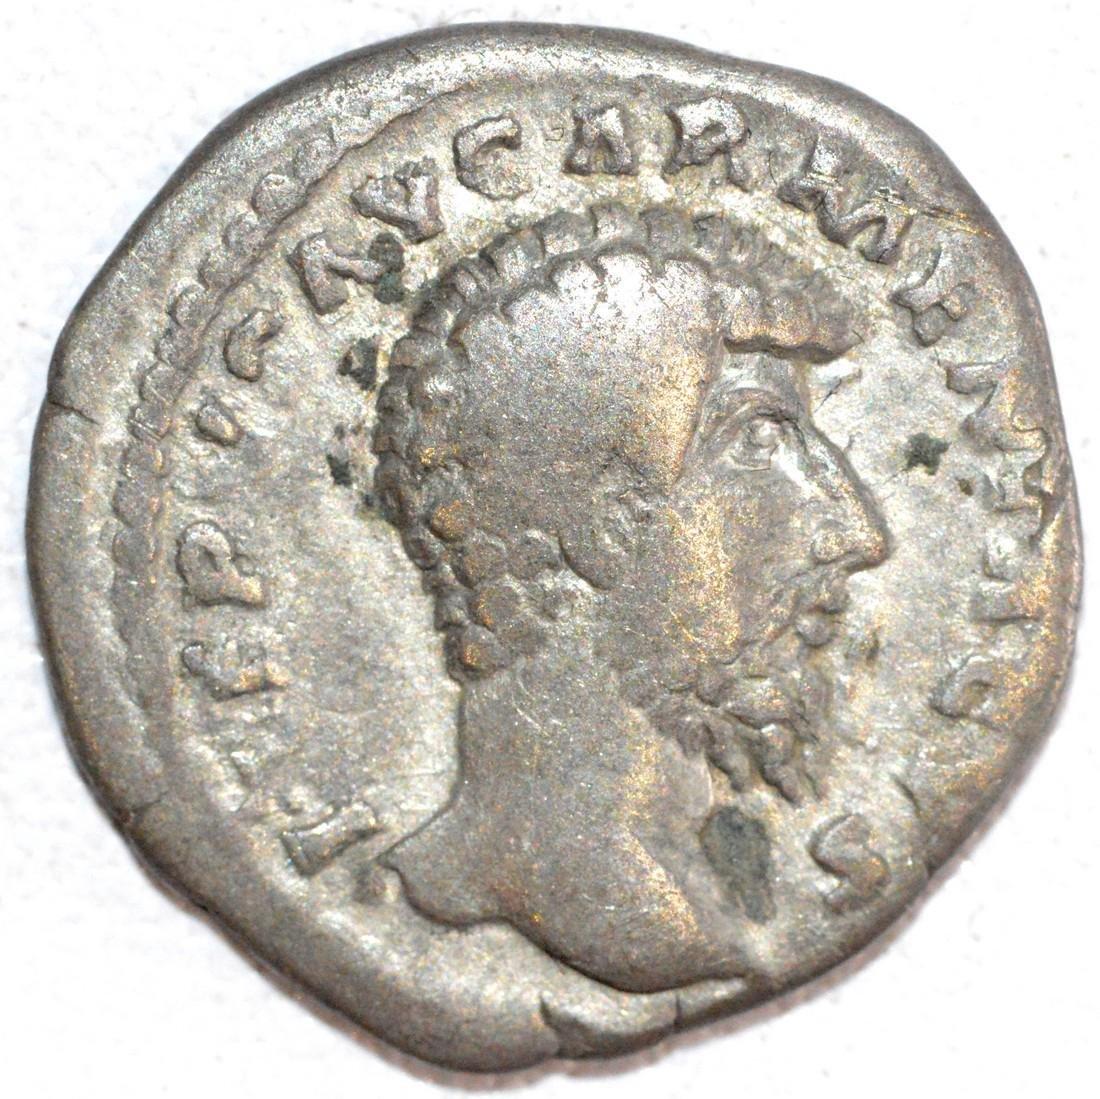 Ancient Roman Silver Denarius of Emperor Lucius Verus.